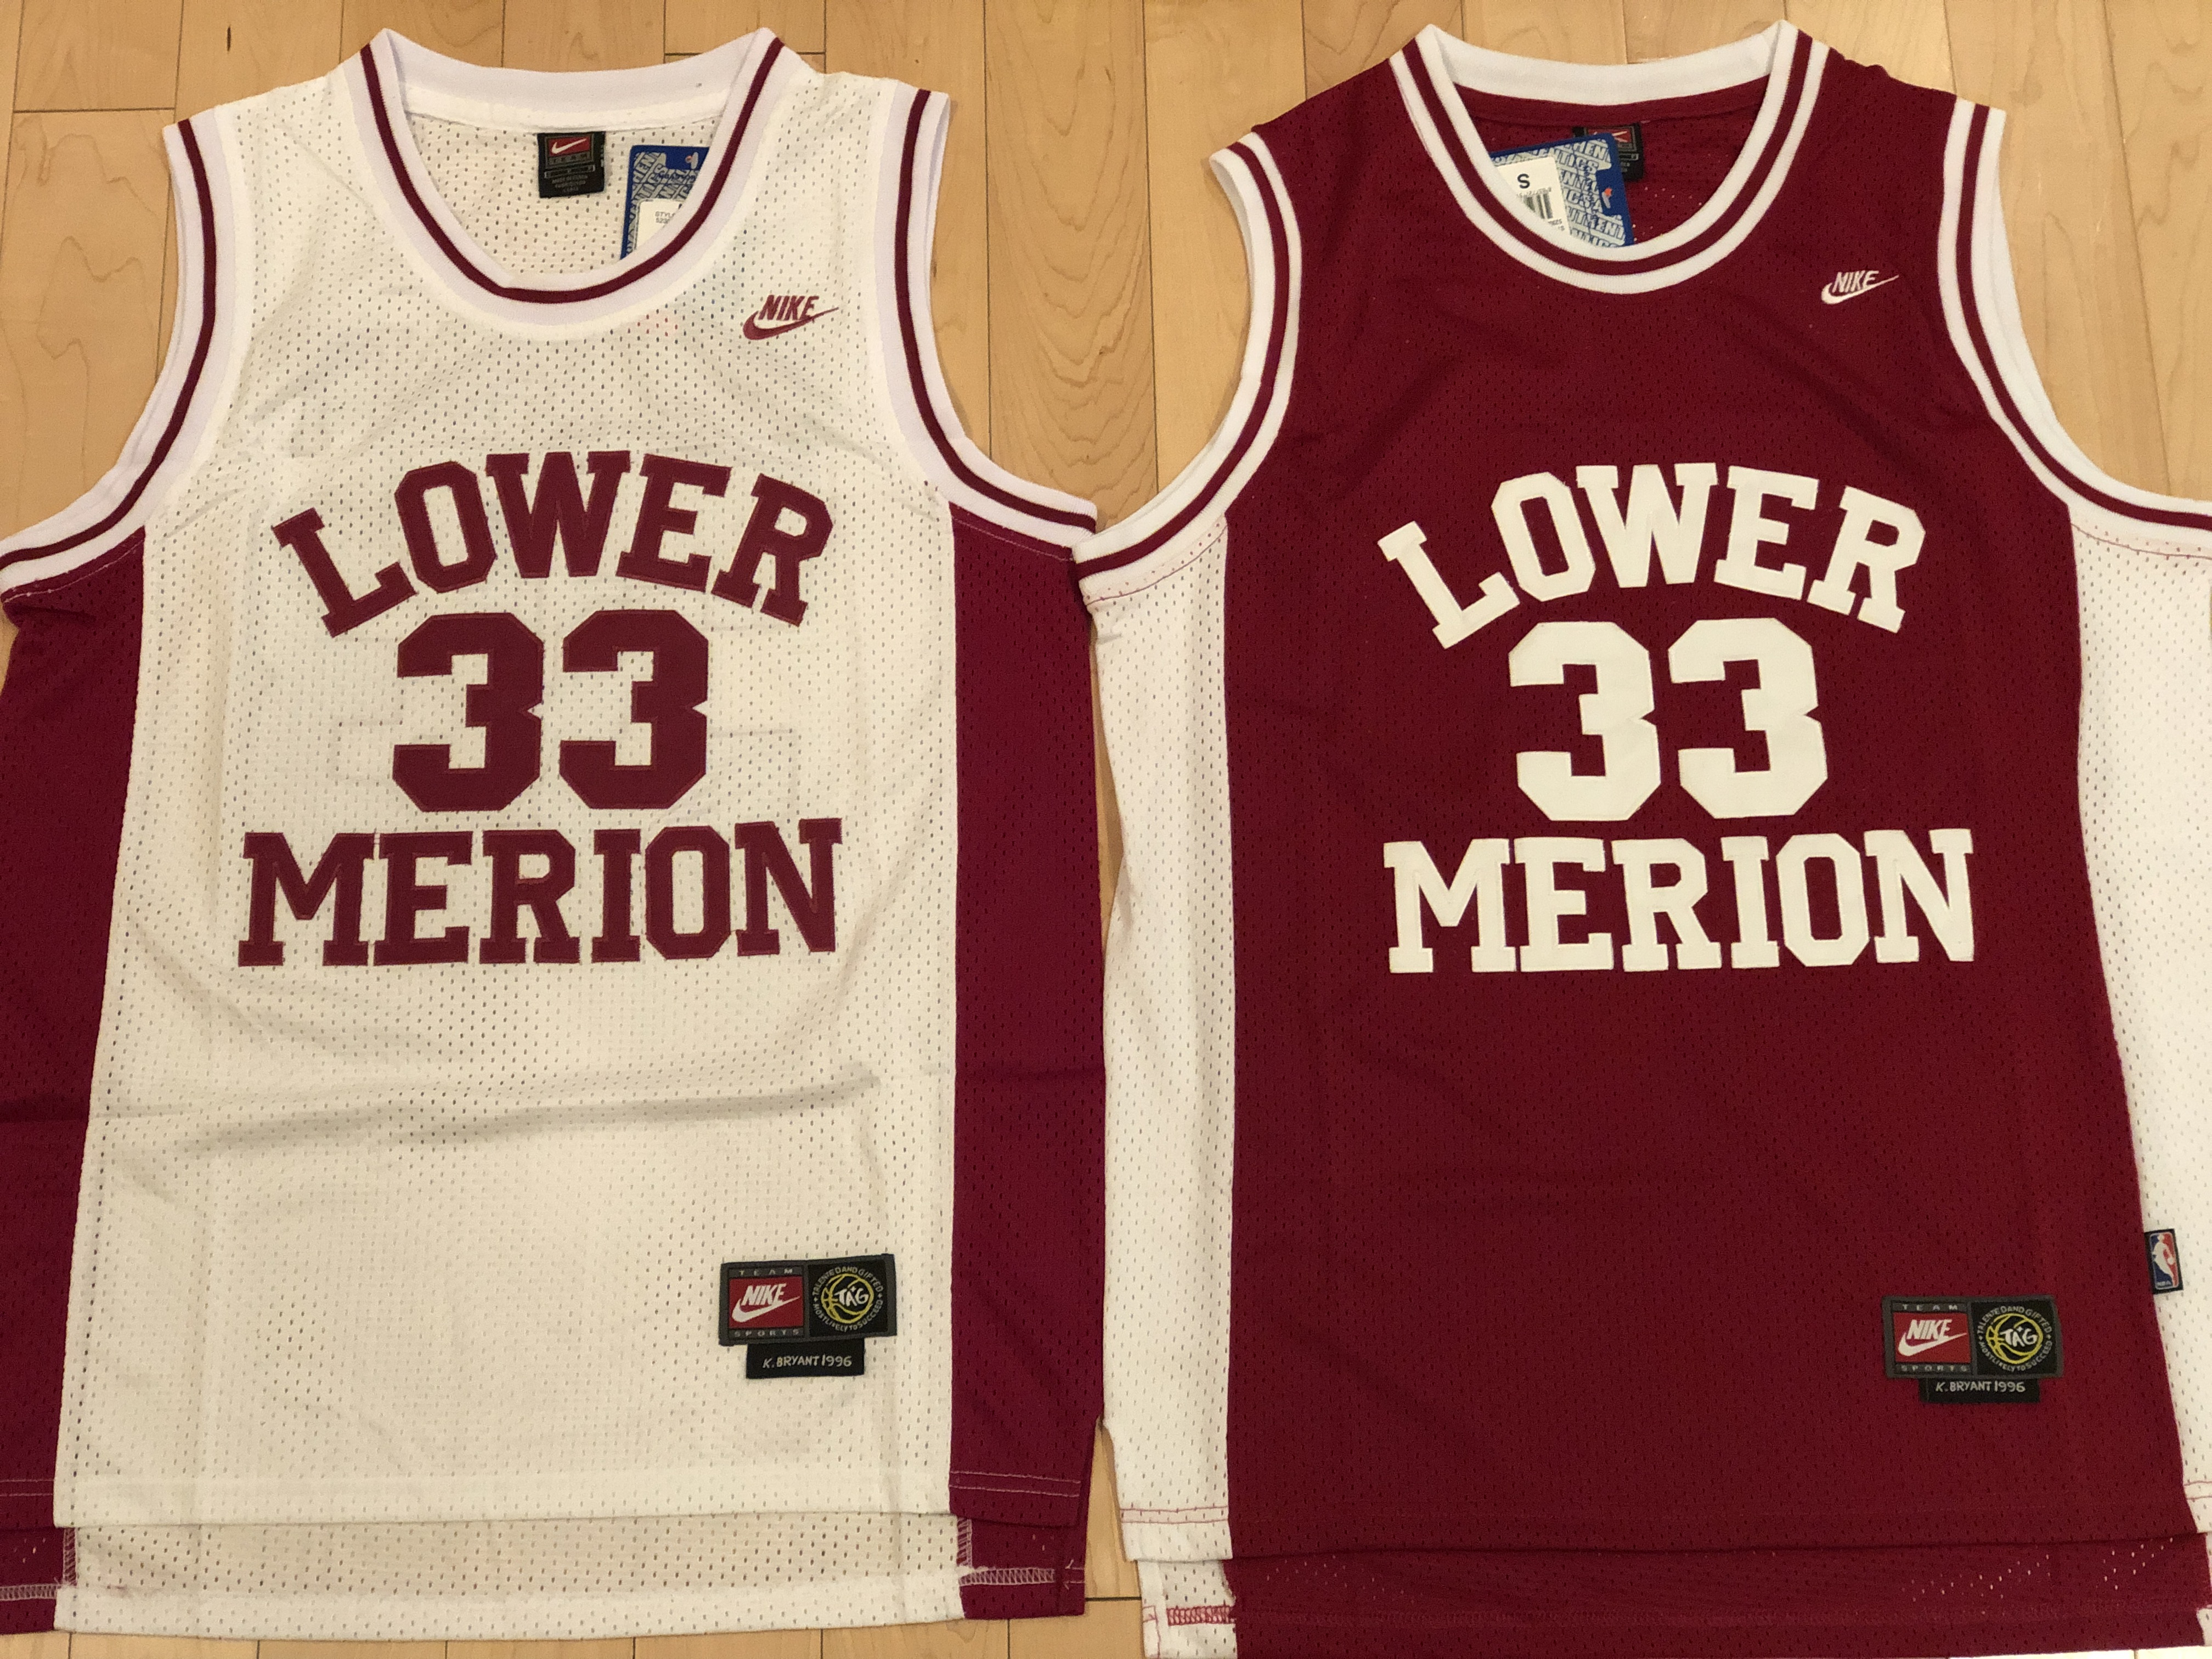 lower merion kobe bryant jersey Off 63% - www.bashhguidelines.org